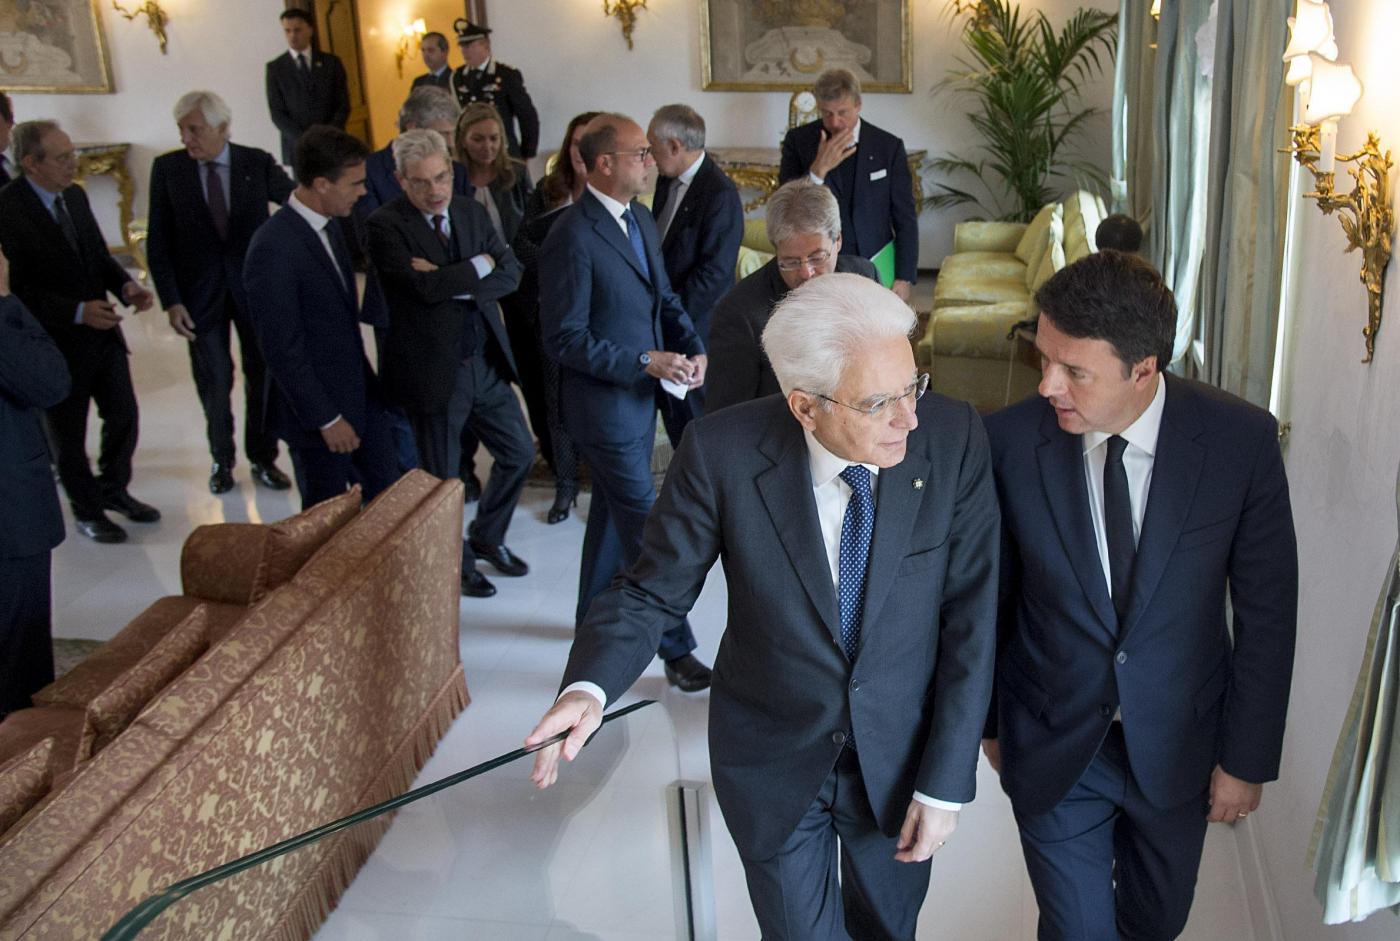 Quirinale, Mattarella riceve Presidente Renzi